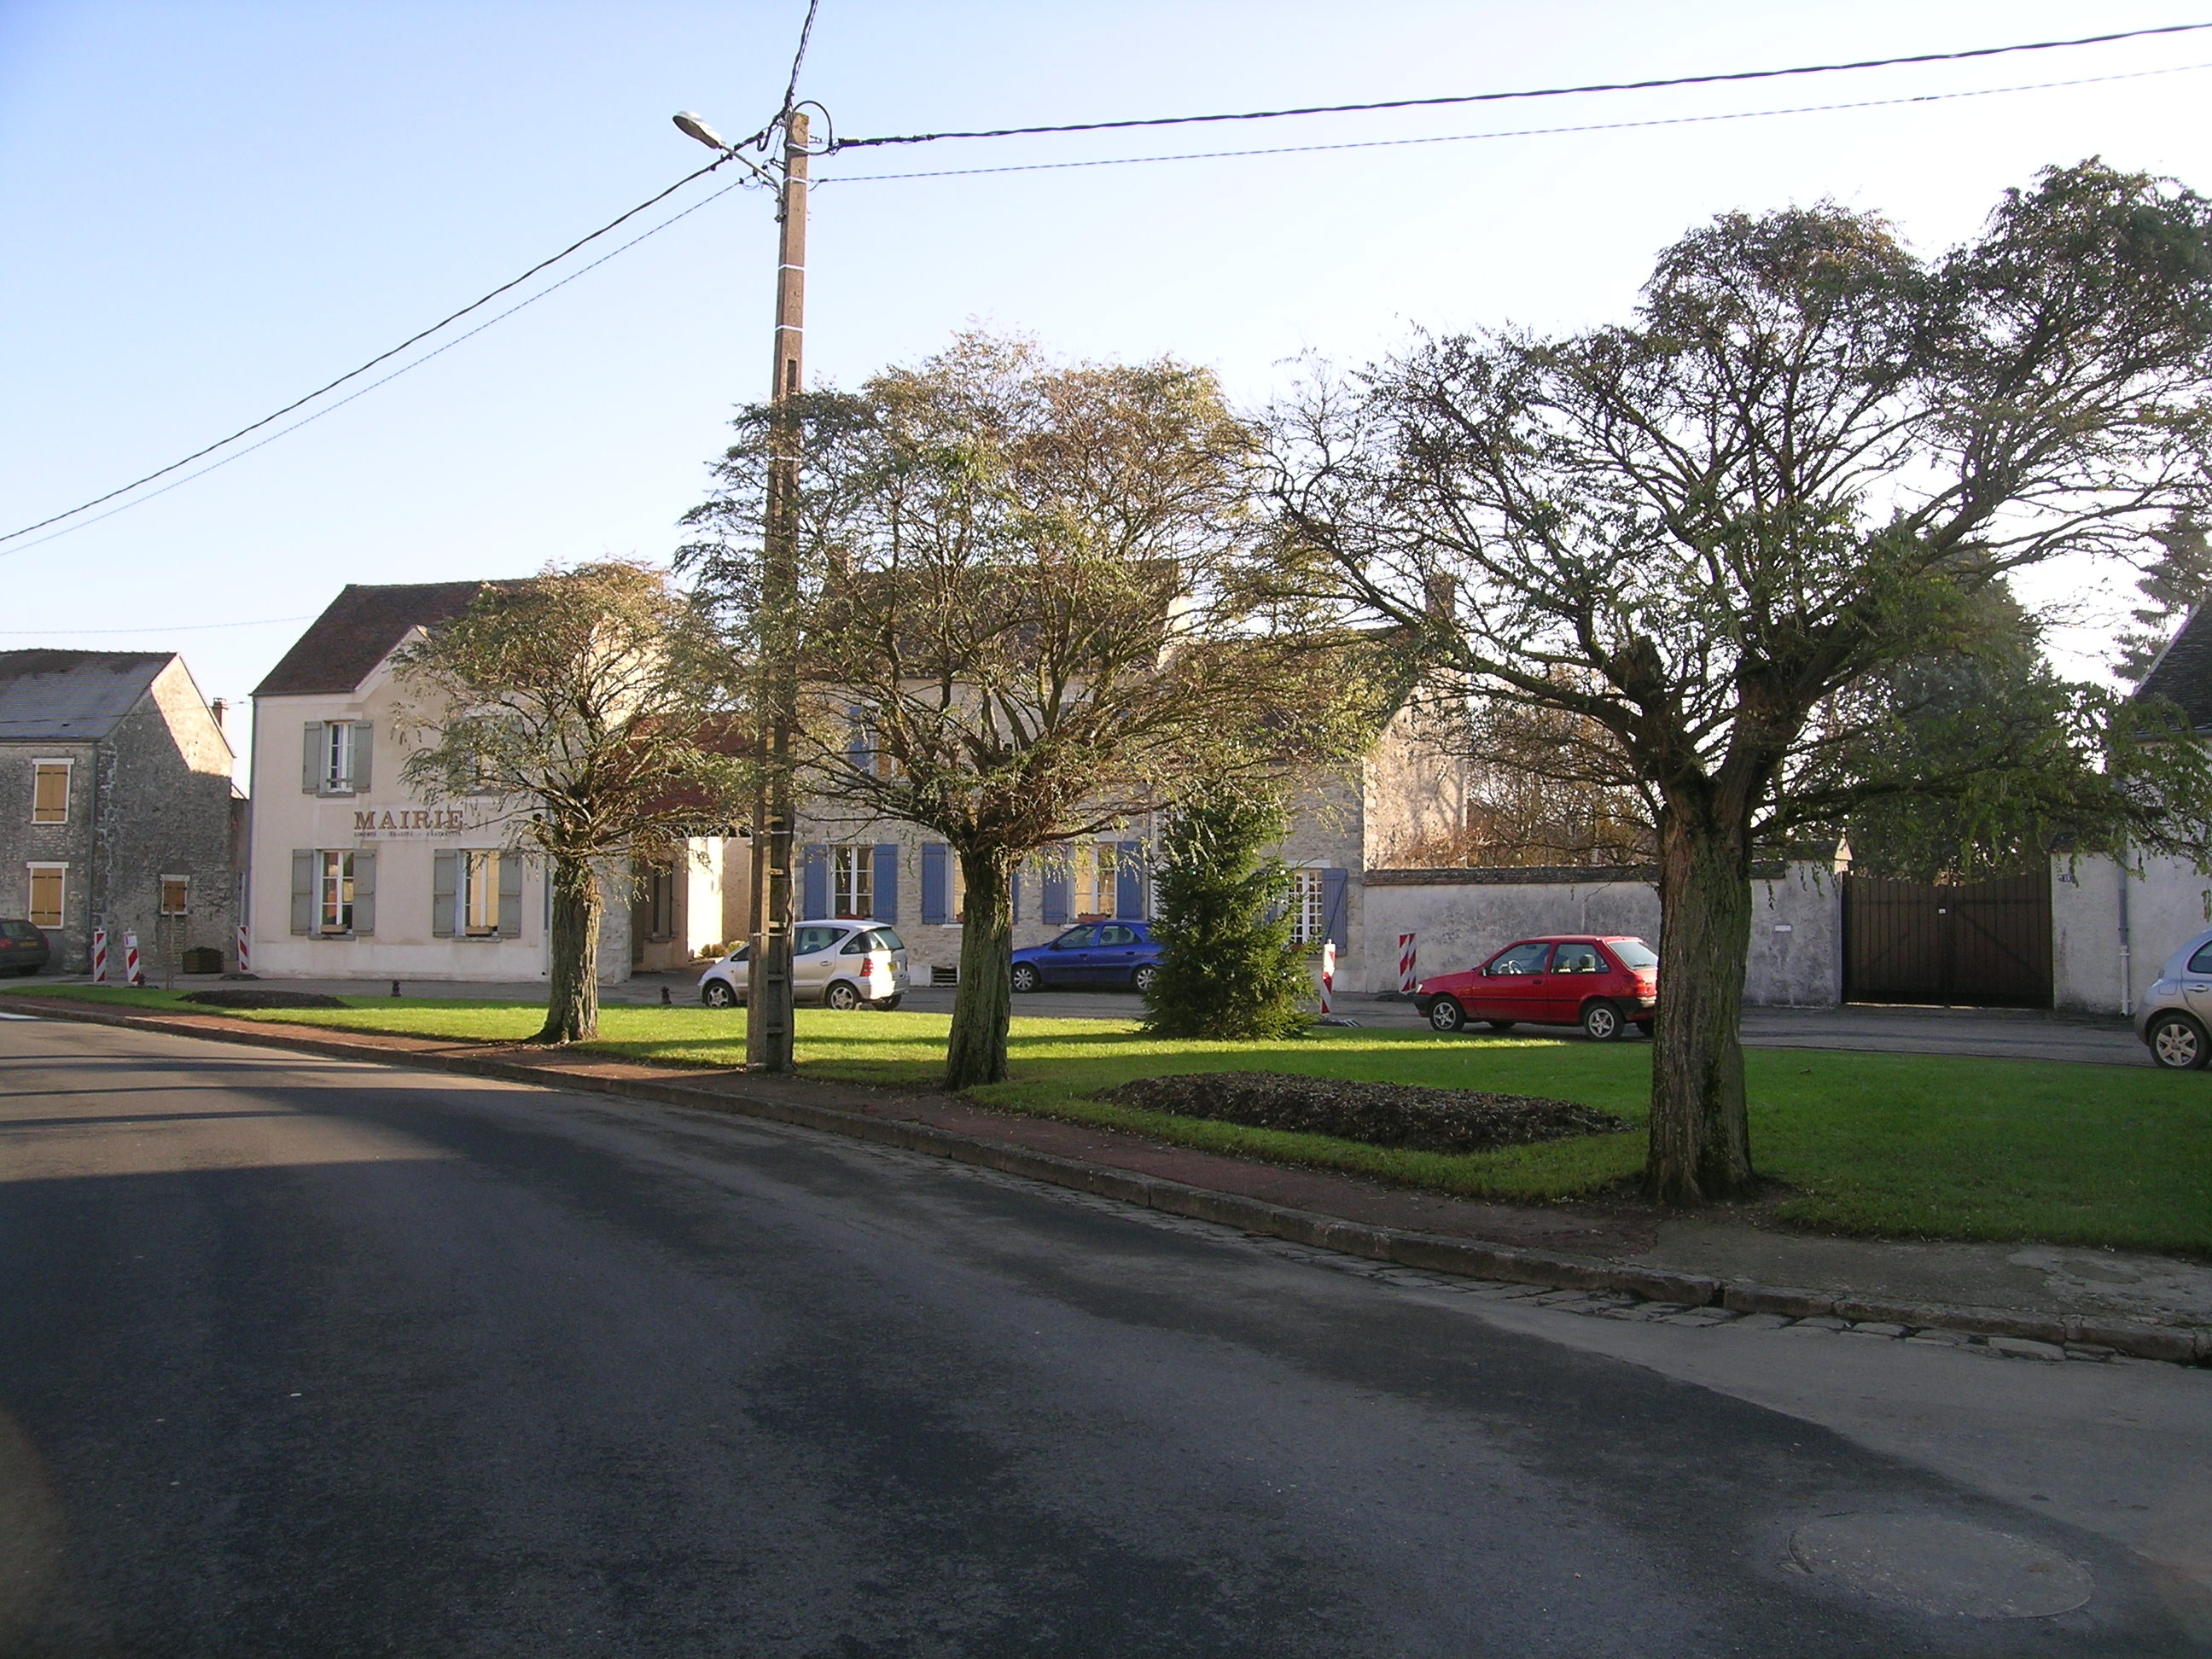 Amponville